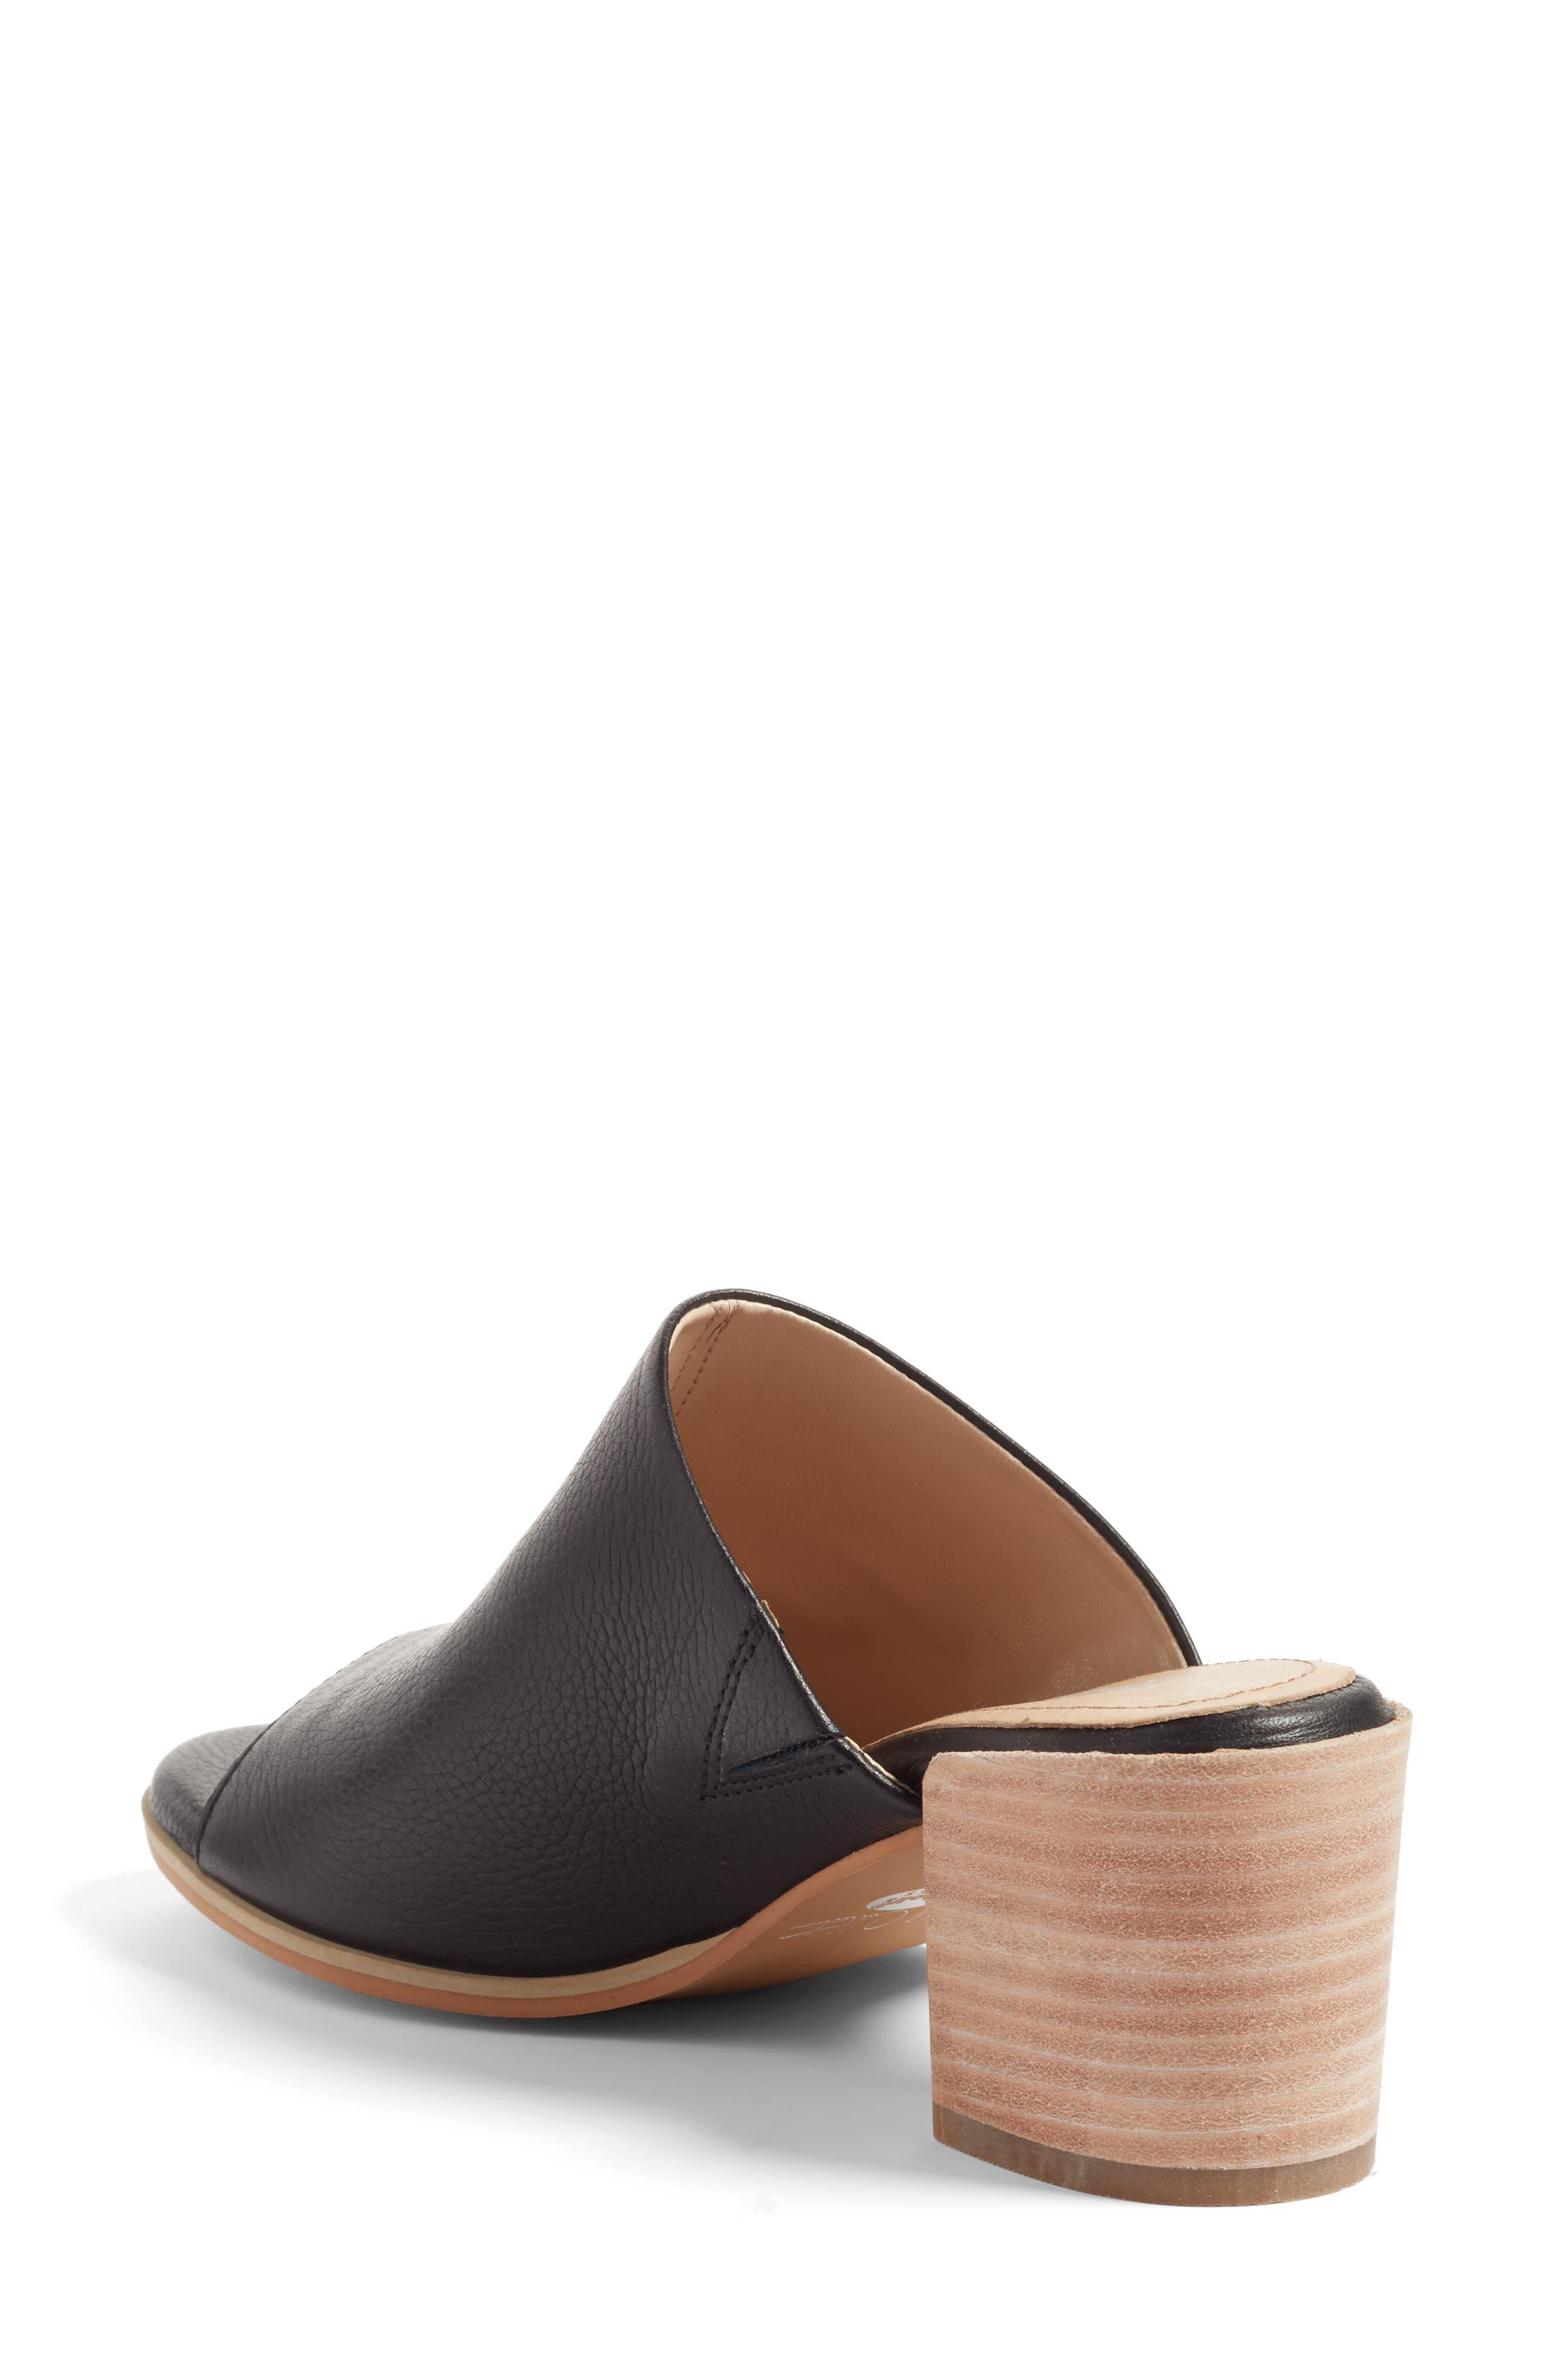 Malin Block Heel Sandal,                             Alternate thumbnail 2, color,                             001